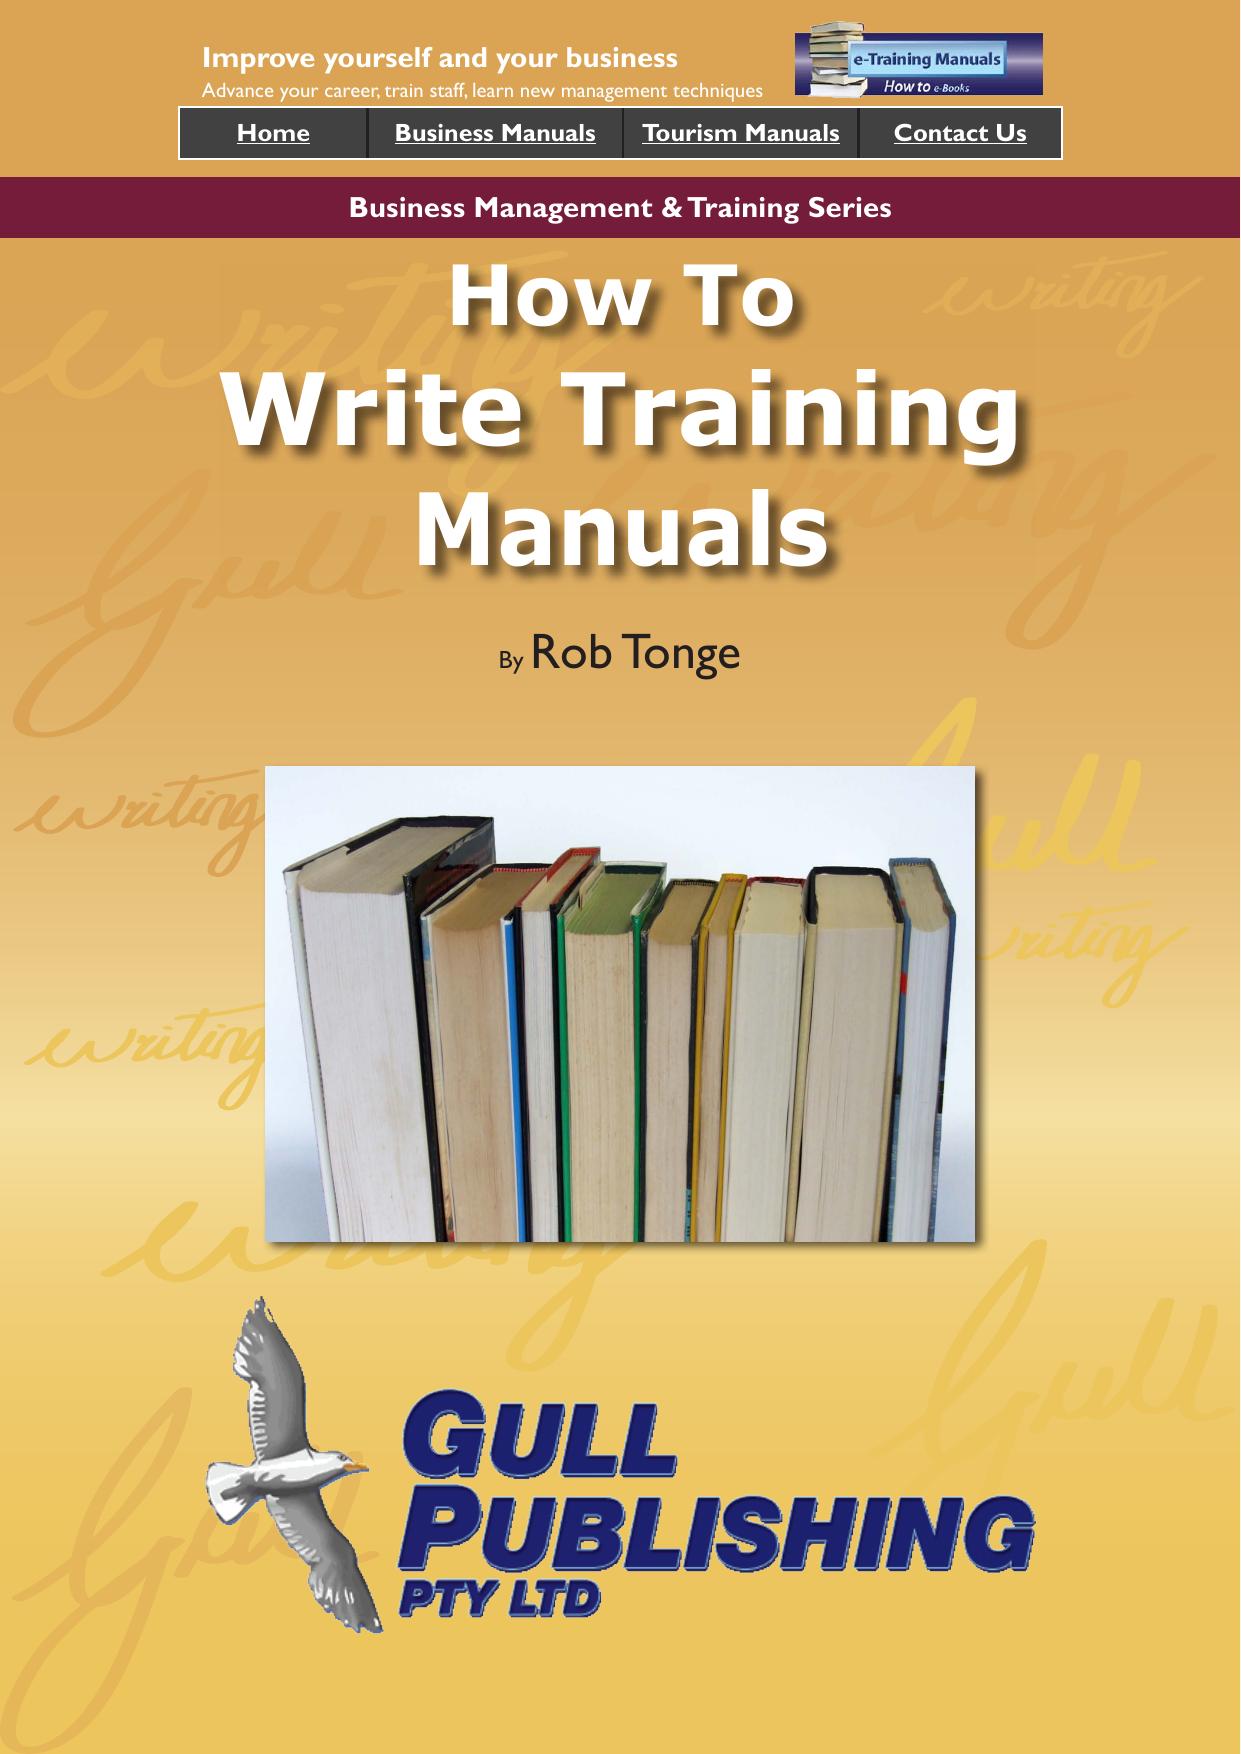 Write Training Manuals